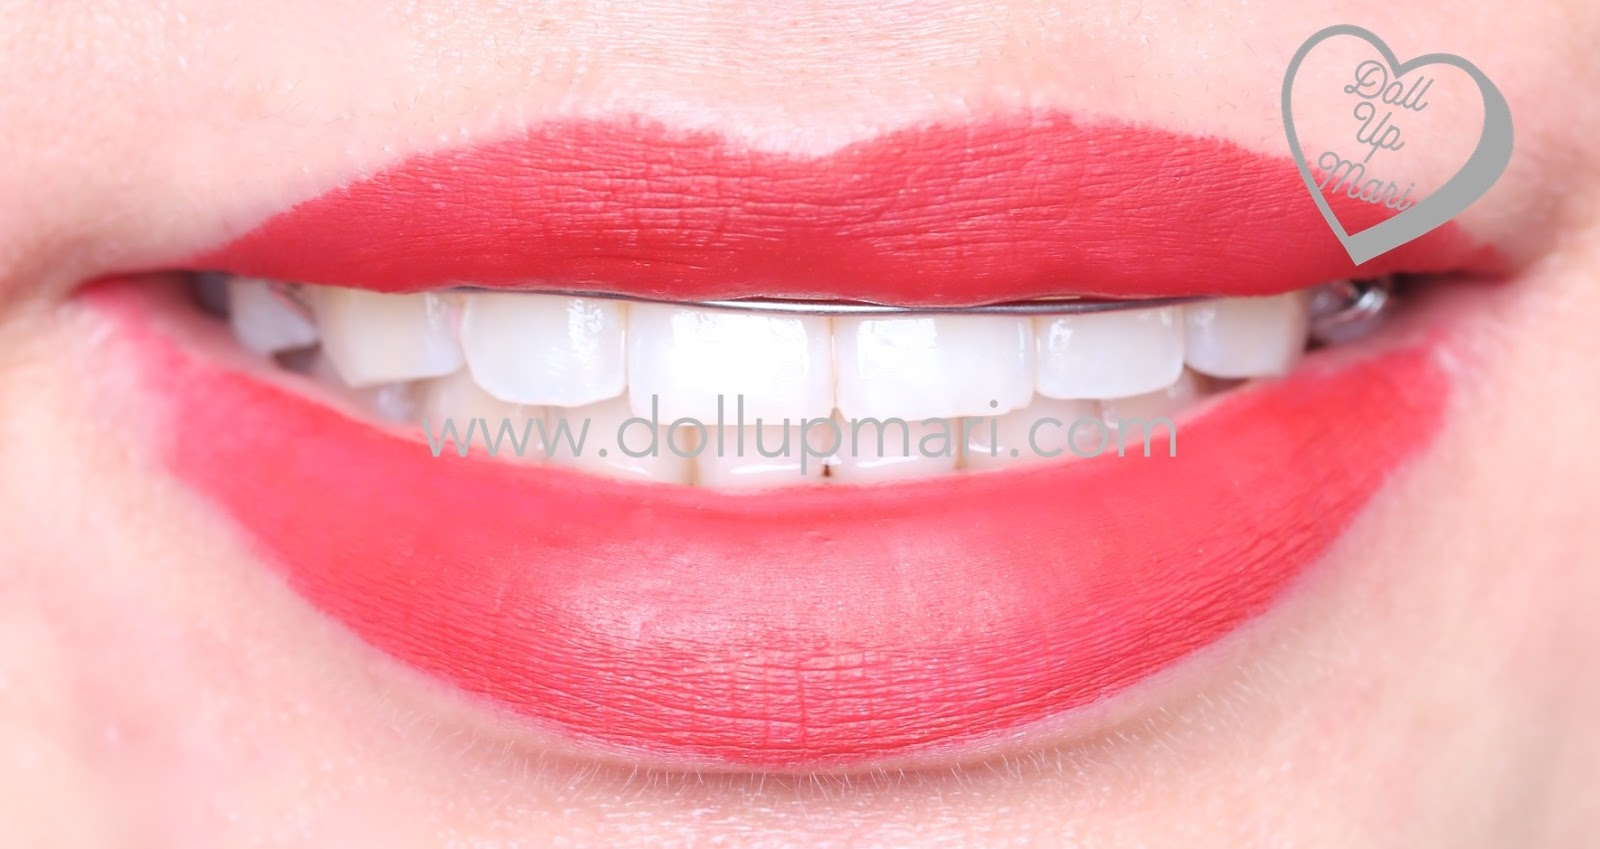 lip swatch of SilkyGirl Matte Junkie Lipcolor (09 Rouge)